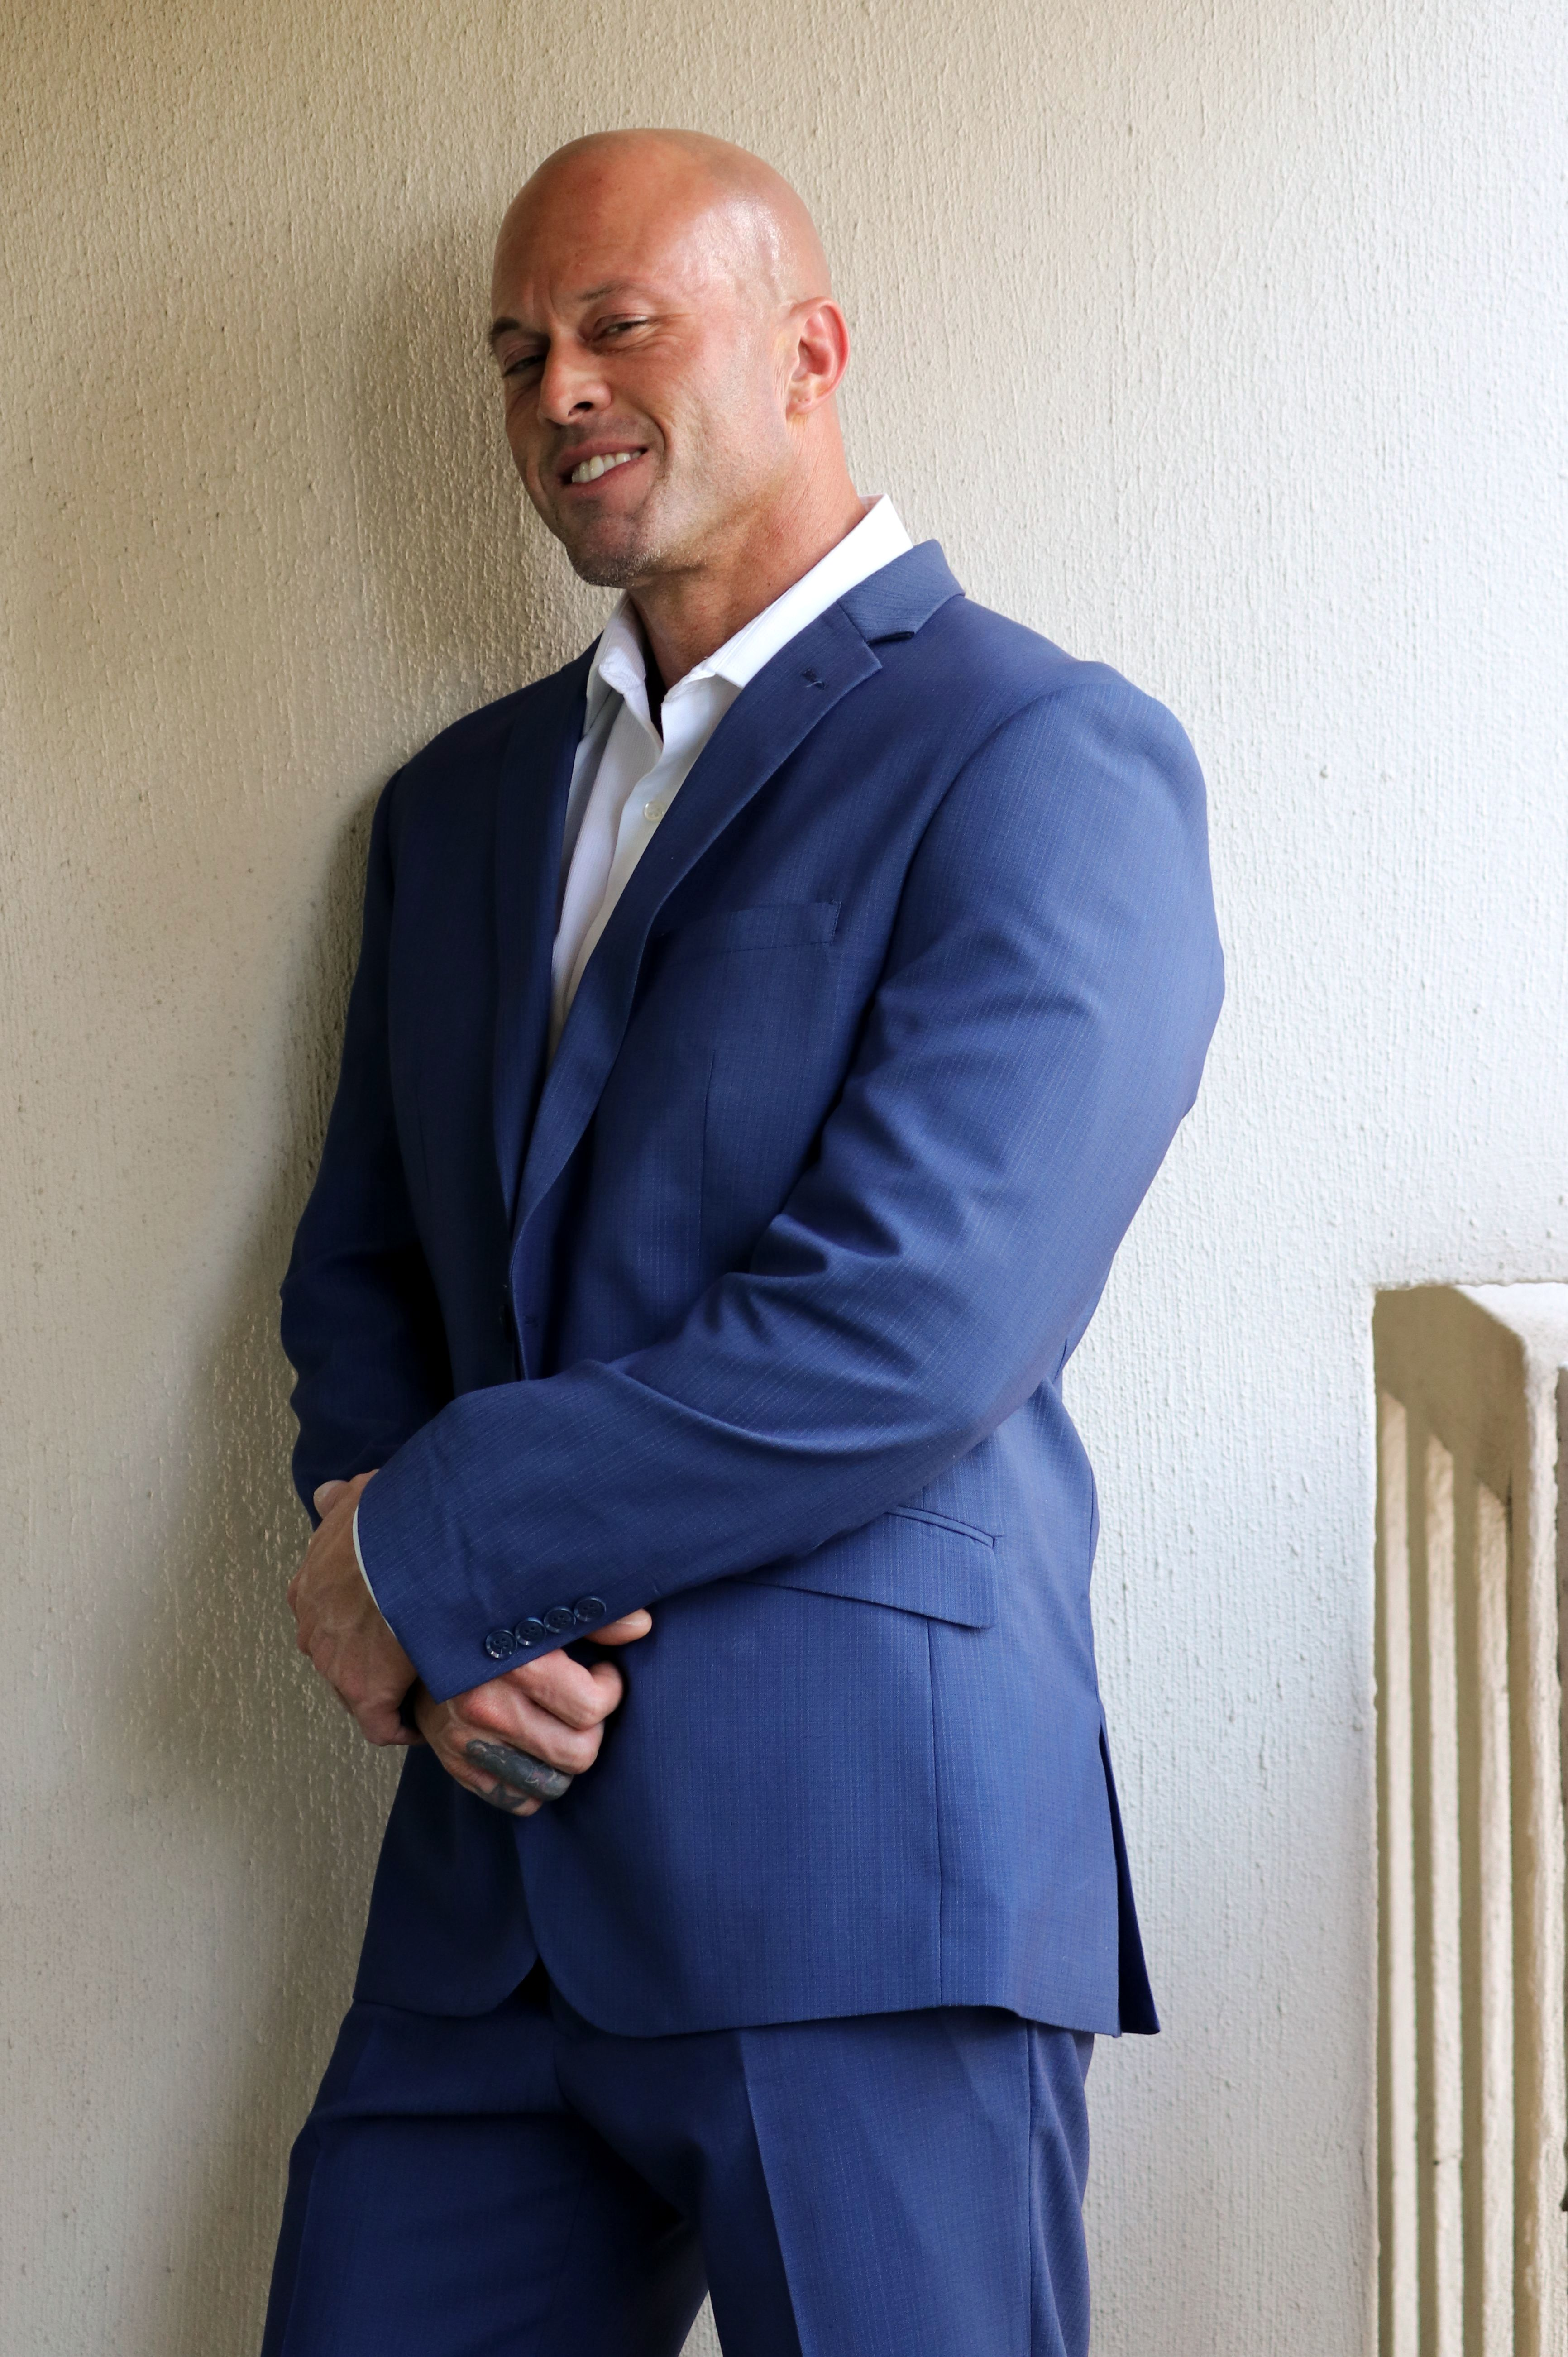 Model & Actor John Quinlan by Claudia Bost 5-2017 #JohnQuinlan